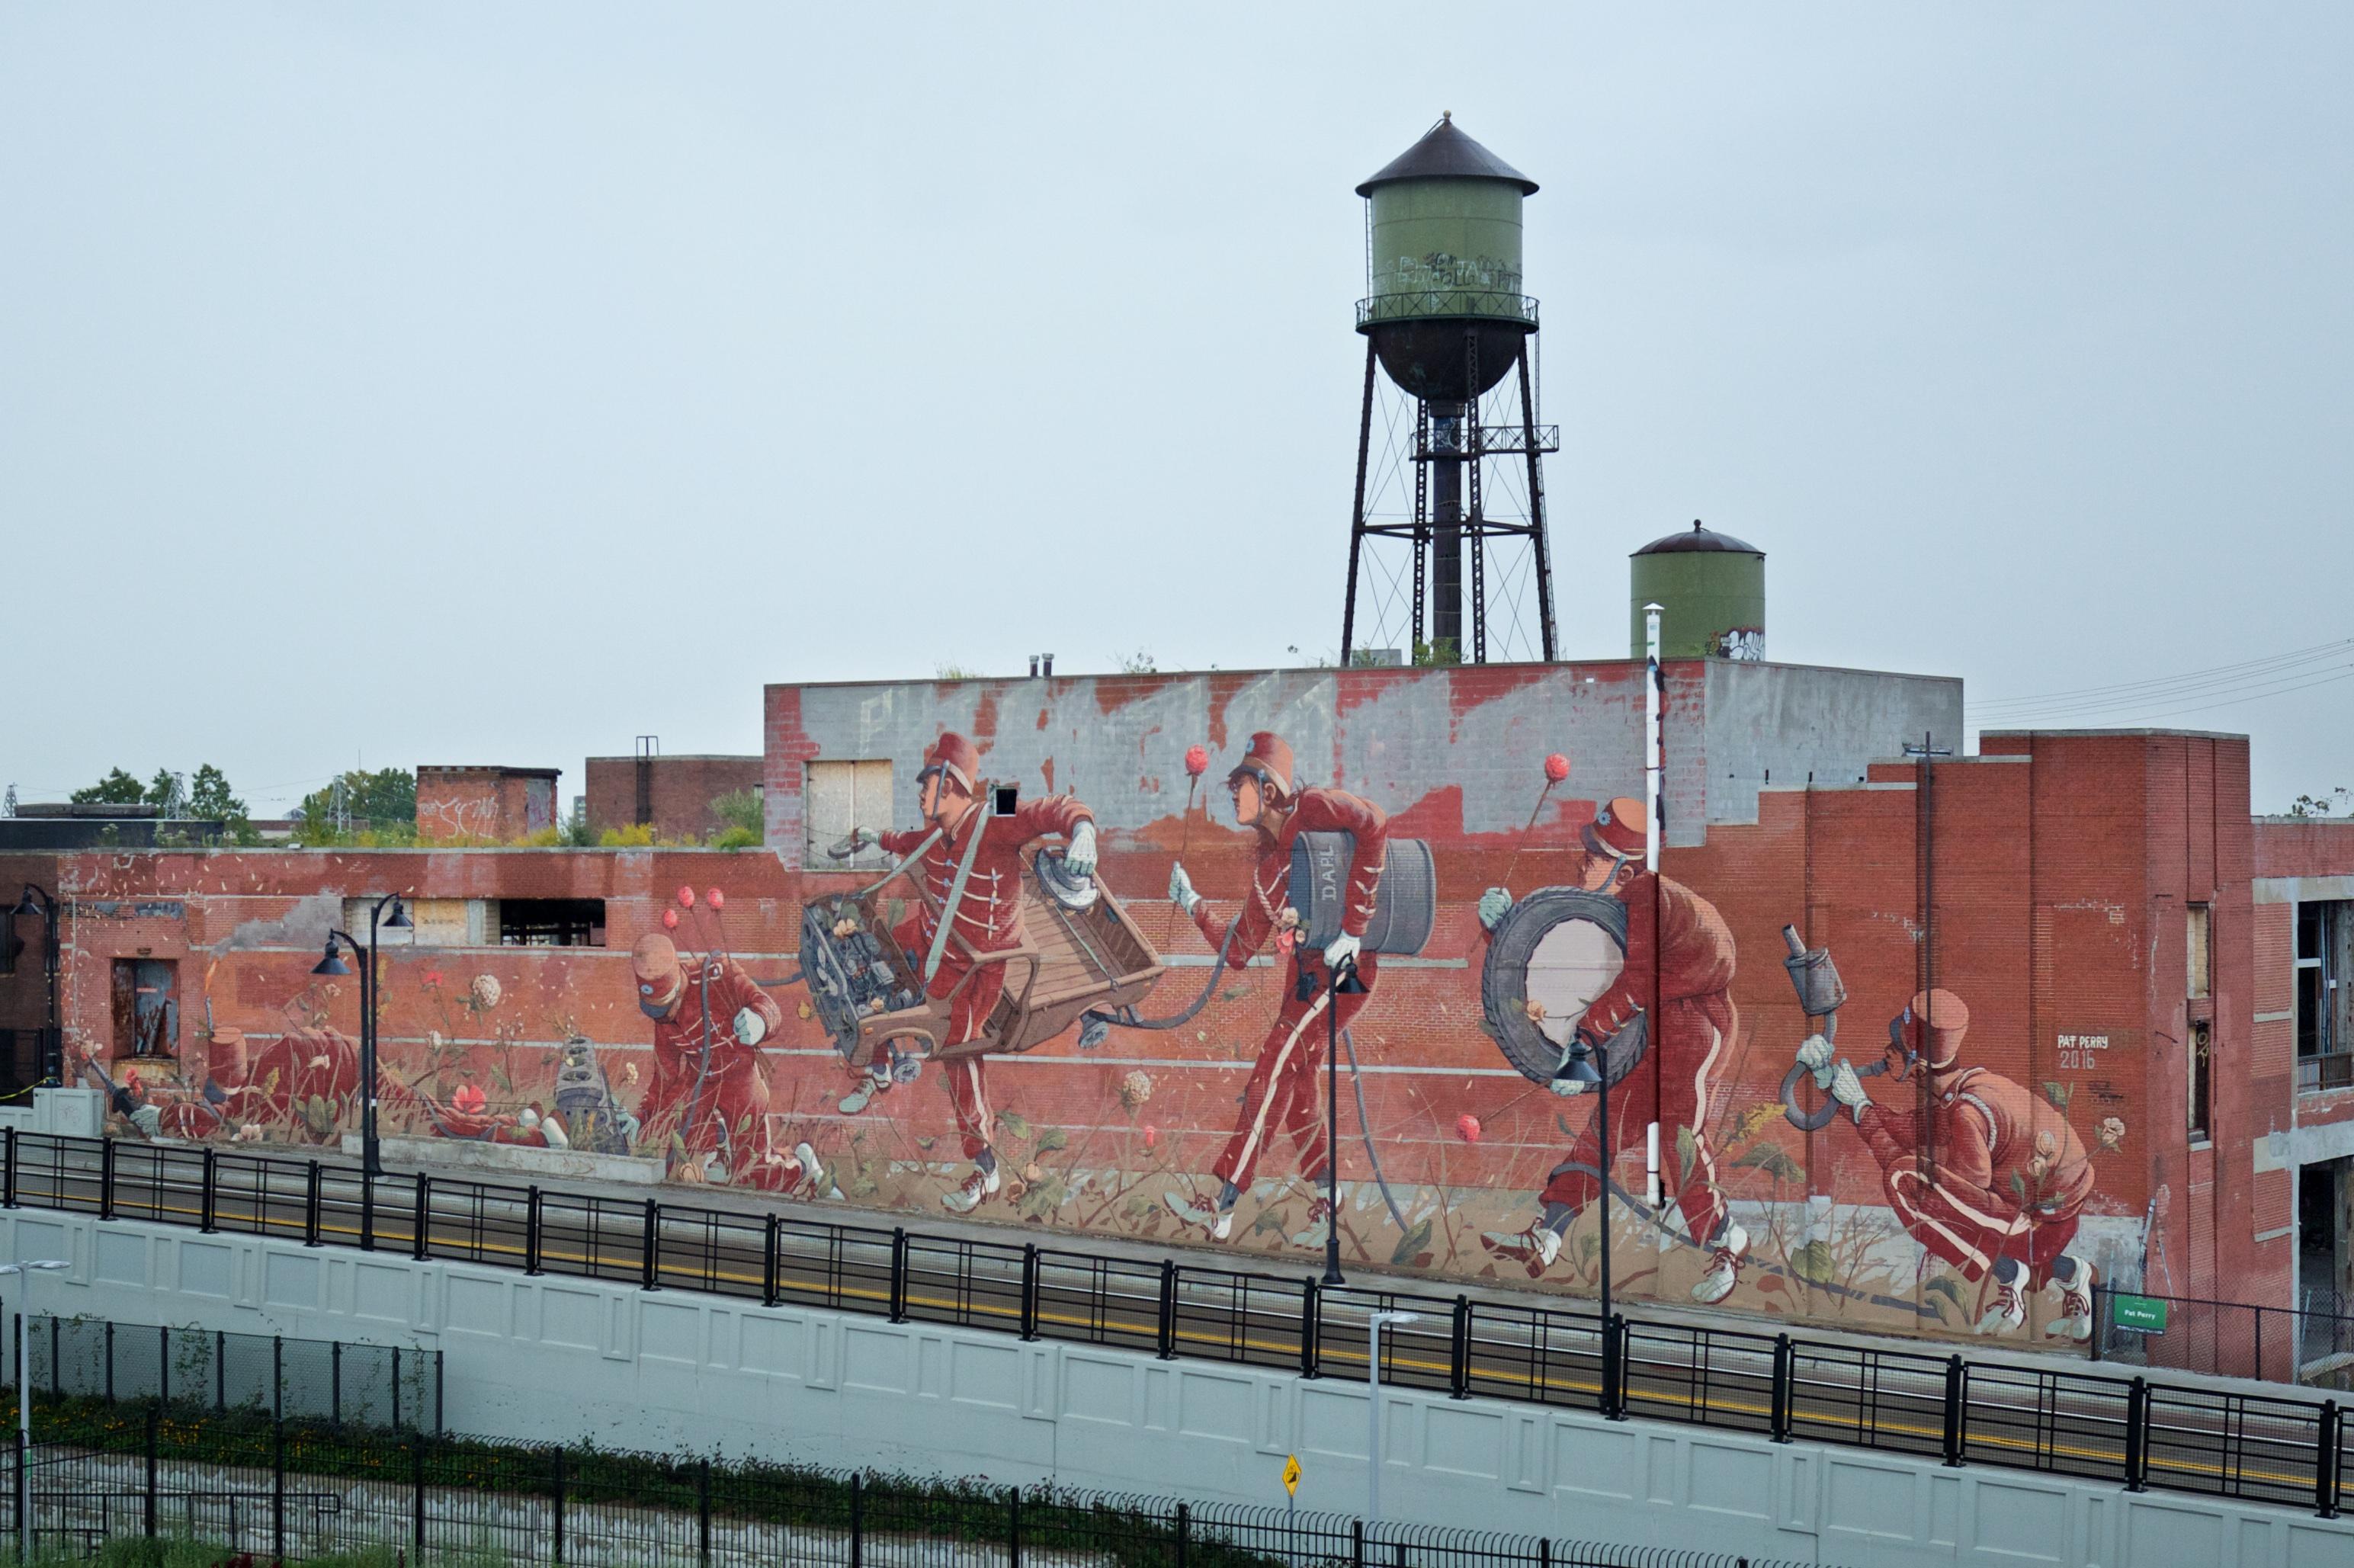 pat-perry_muralsinthemarket_1xrun_finished-walls-6-1